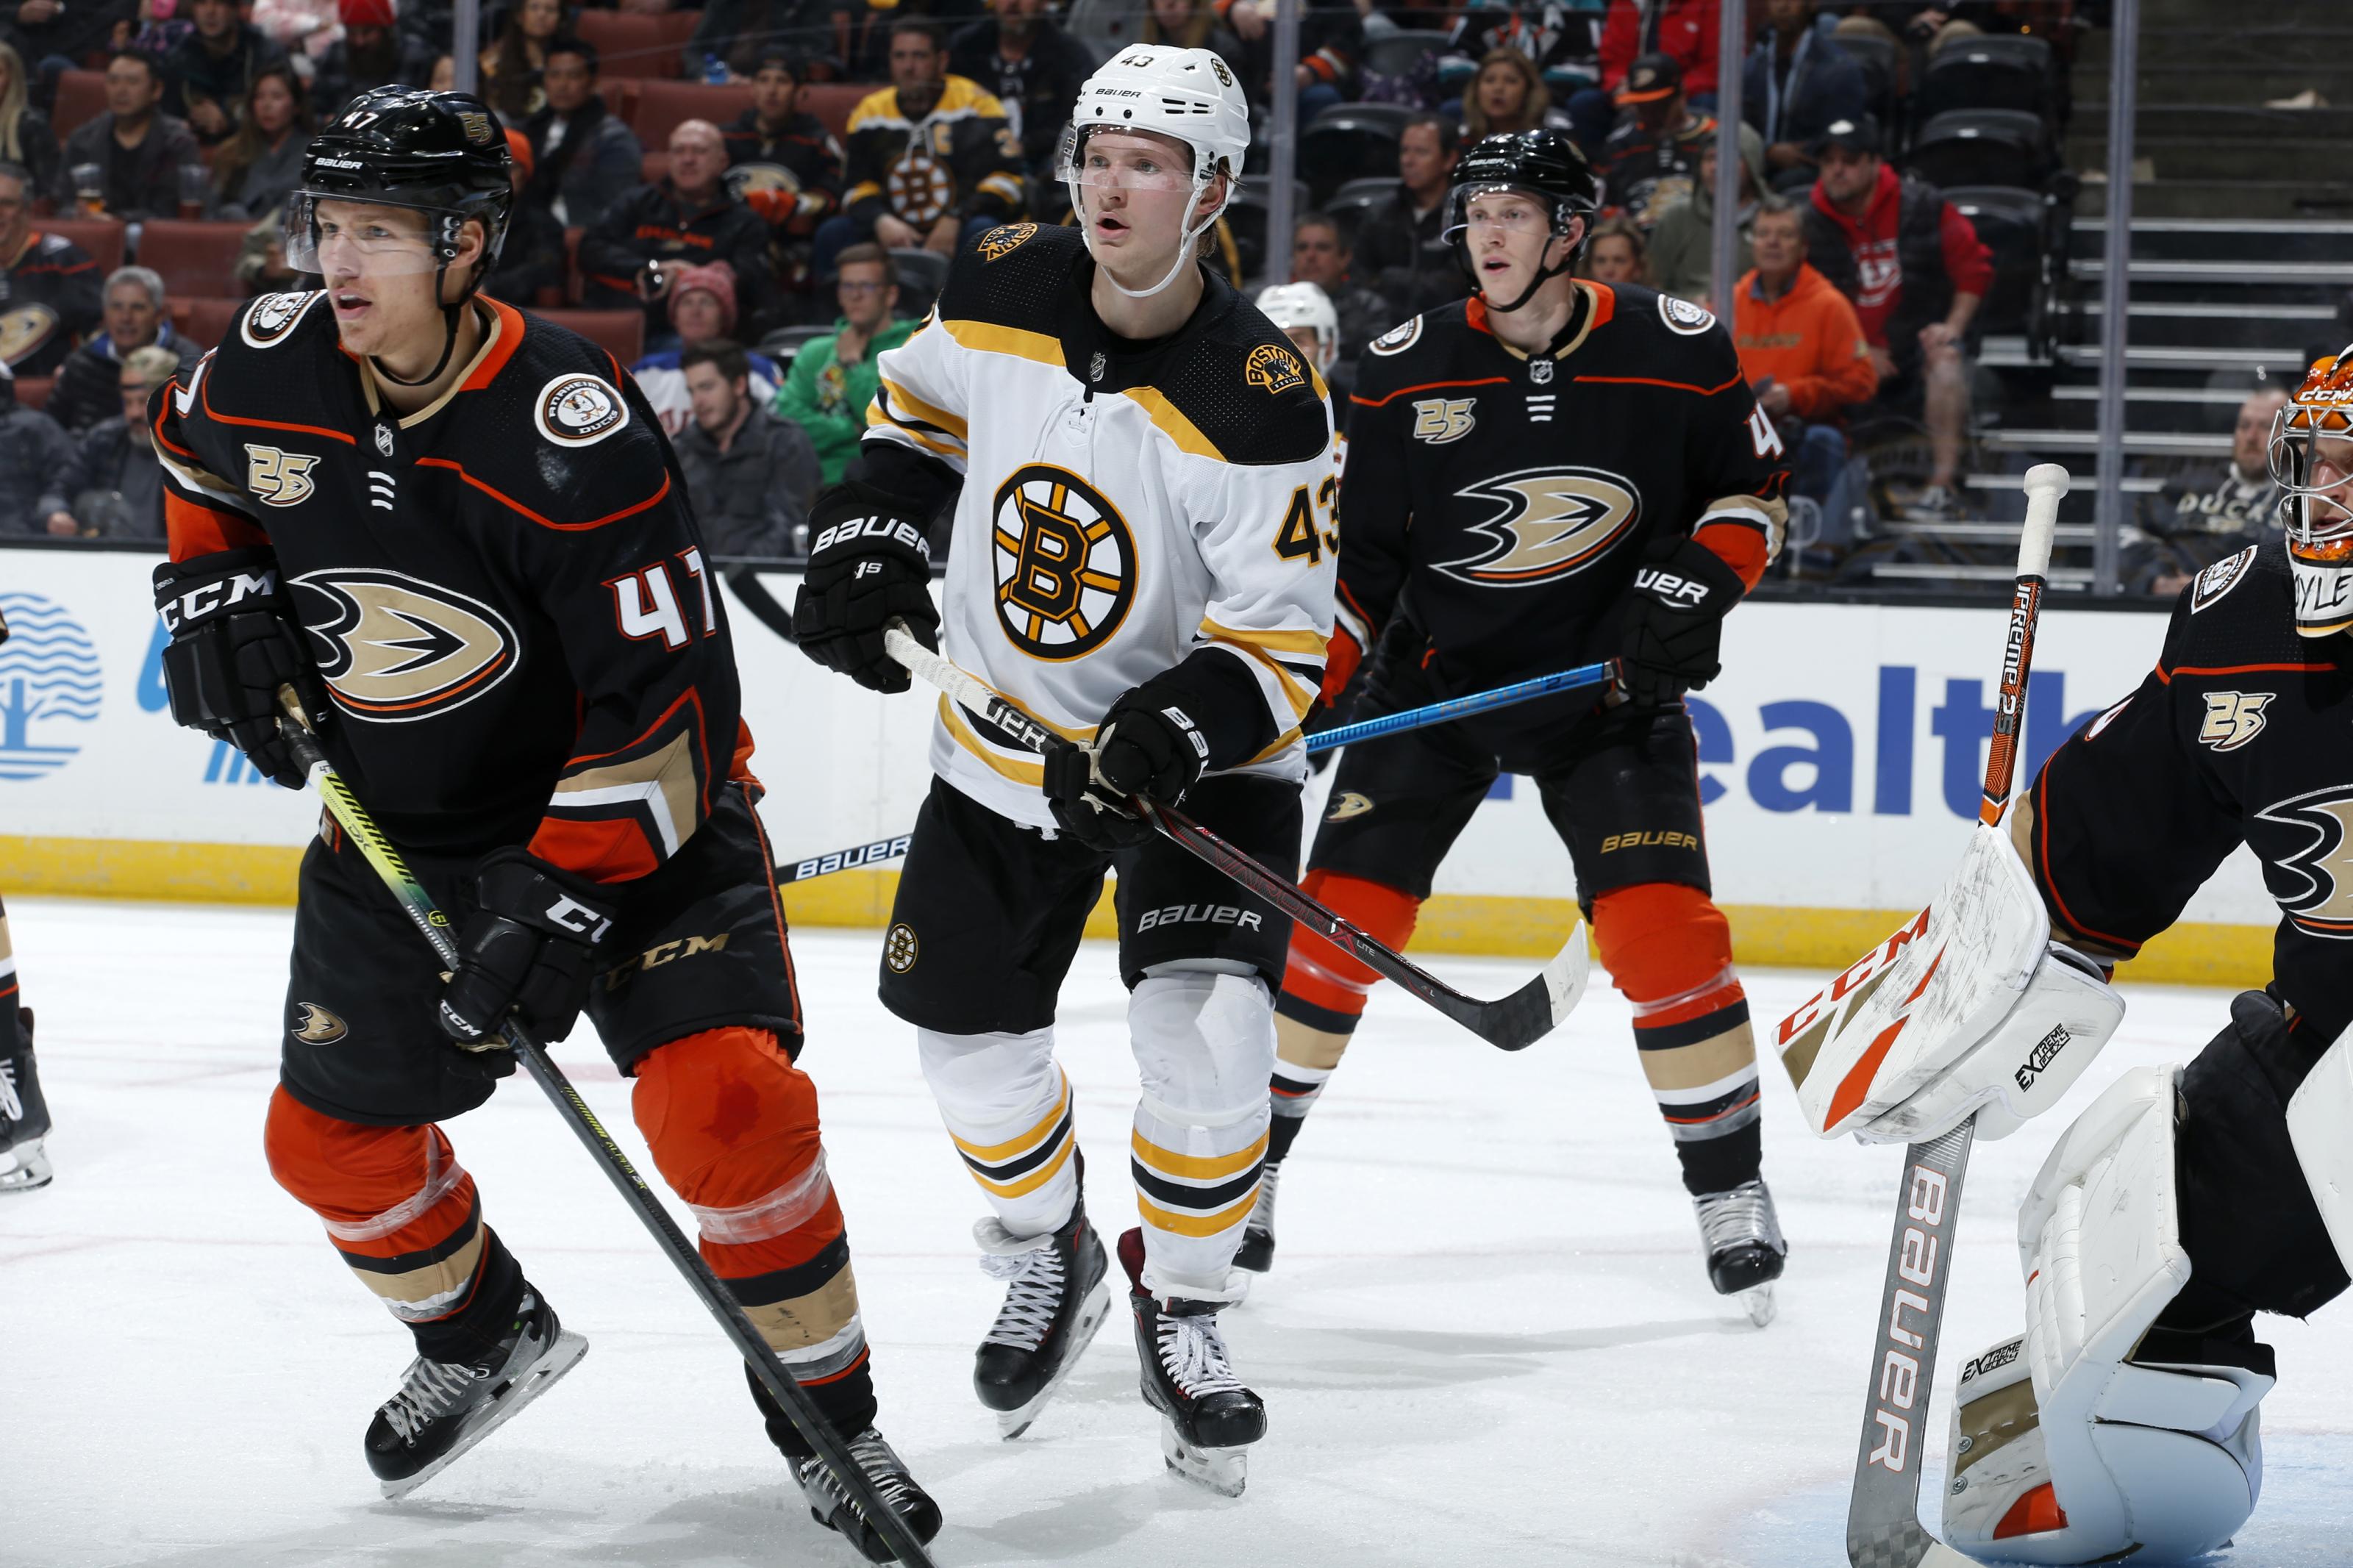 Anaheim Ducks Vs Boston Bruins Start Time Live Streaming Tv Info